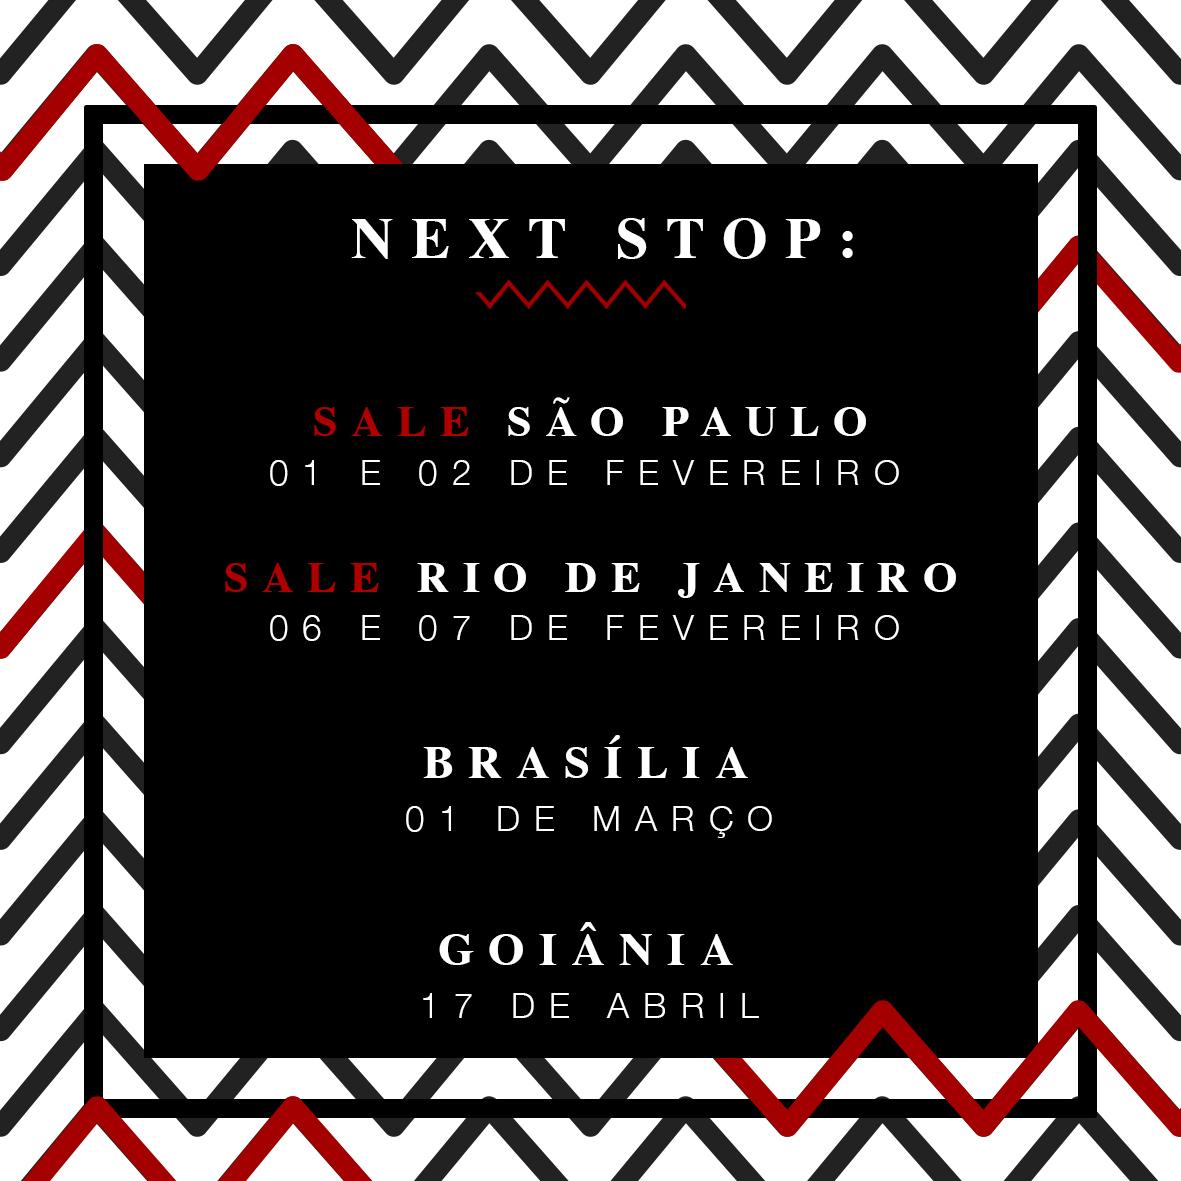 next_stop_10_01_01.jpg